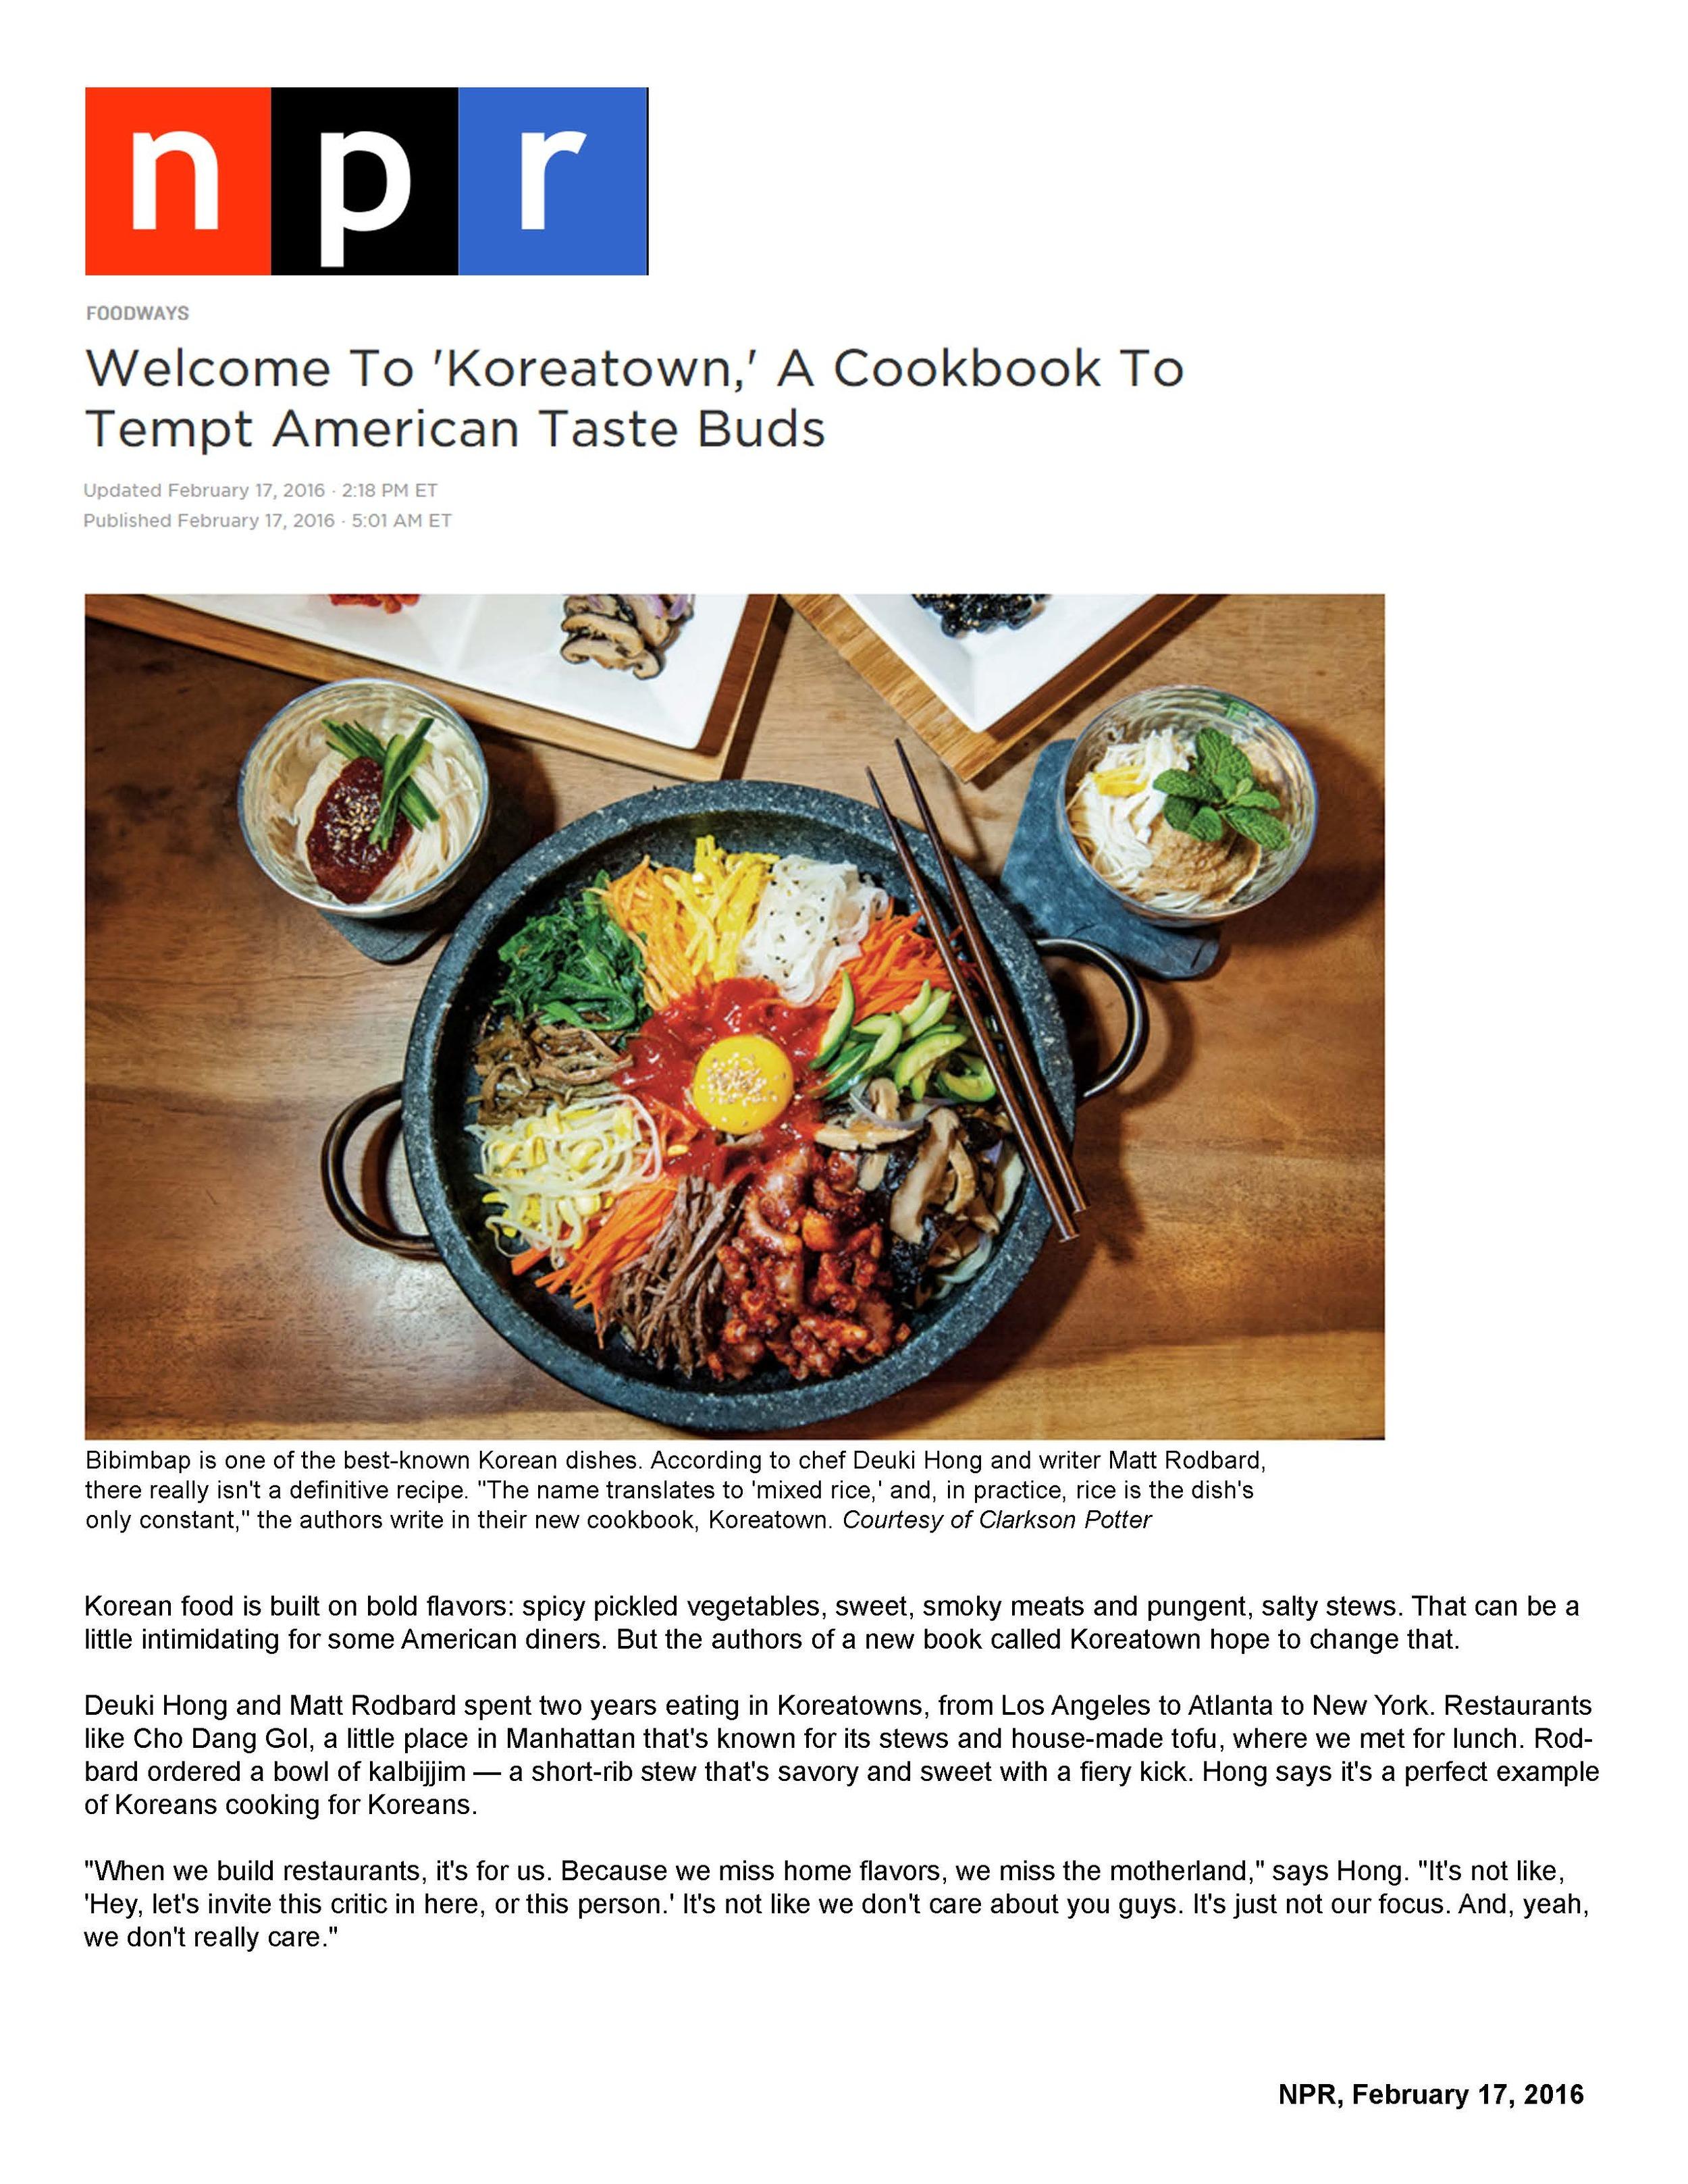 WEBSITE_NPR_Koreatown_February 17 2016_page 1.jpg